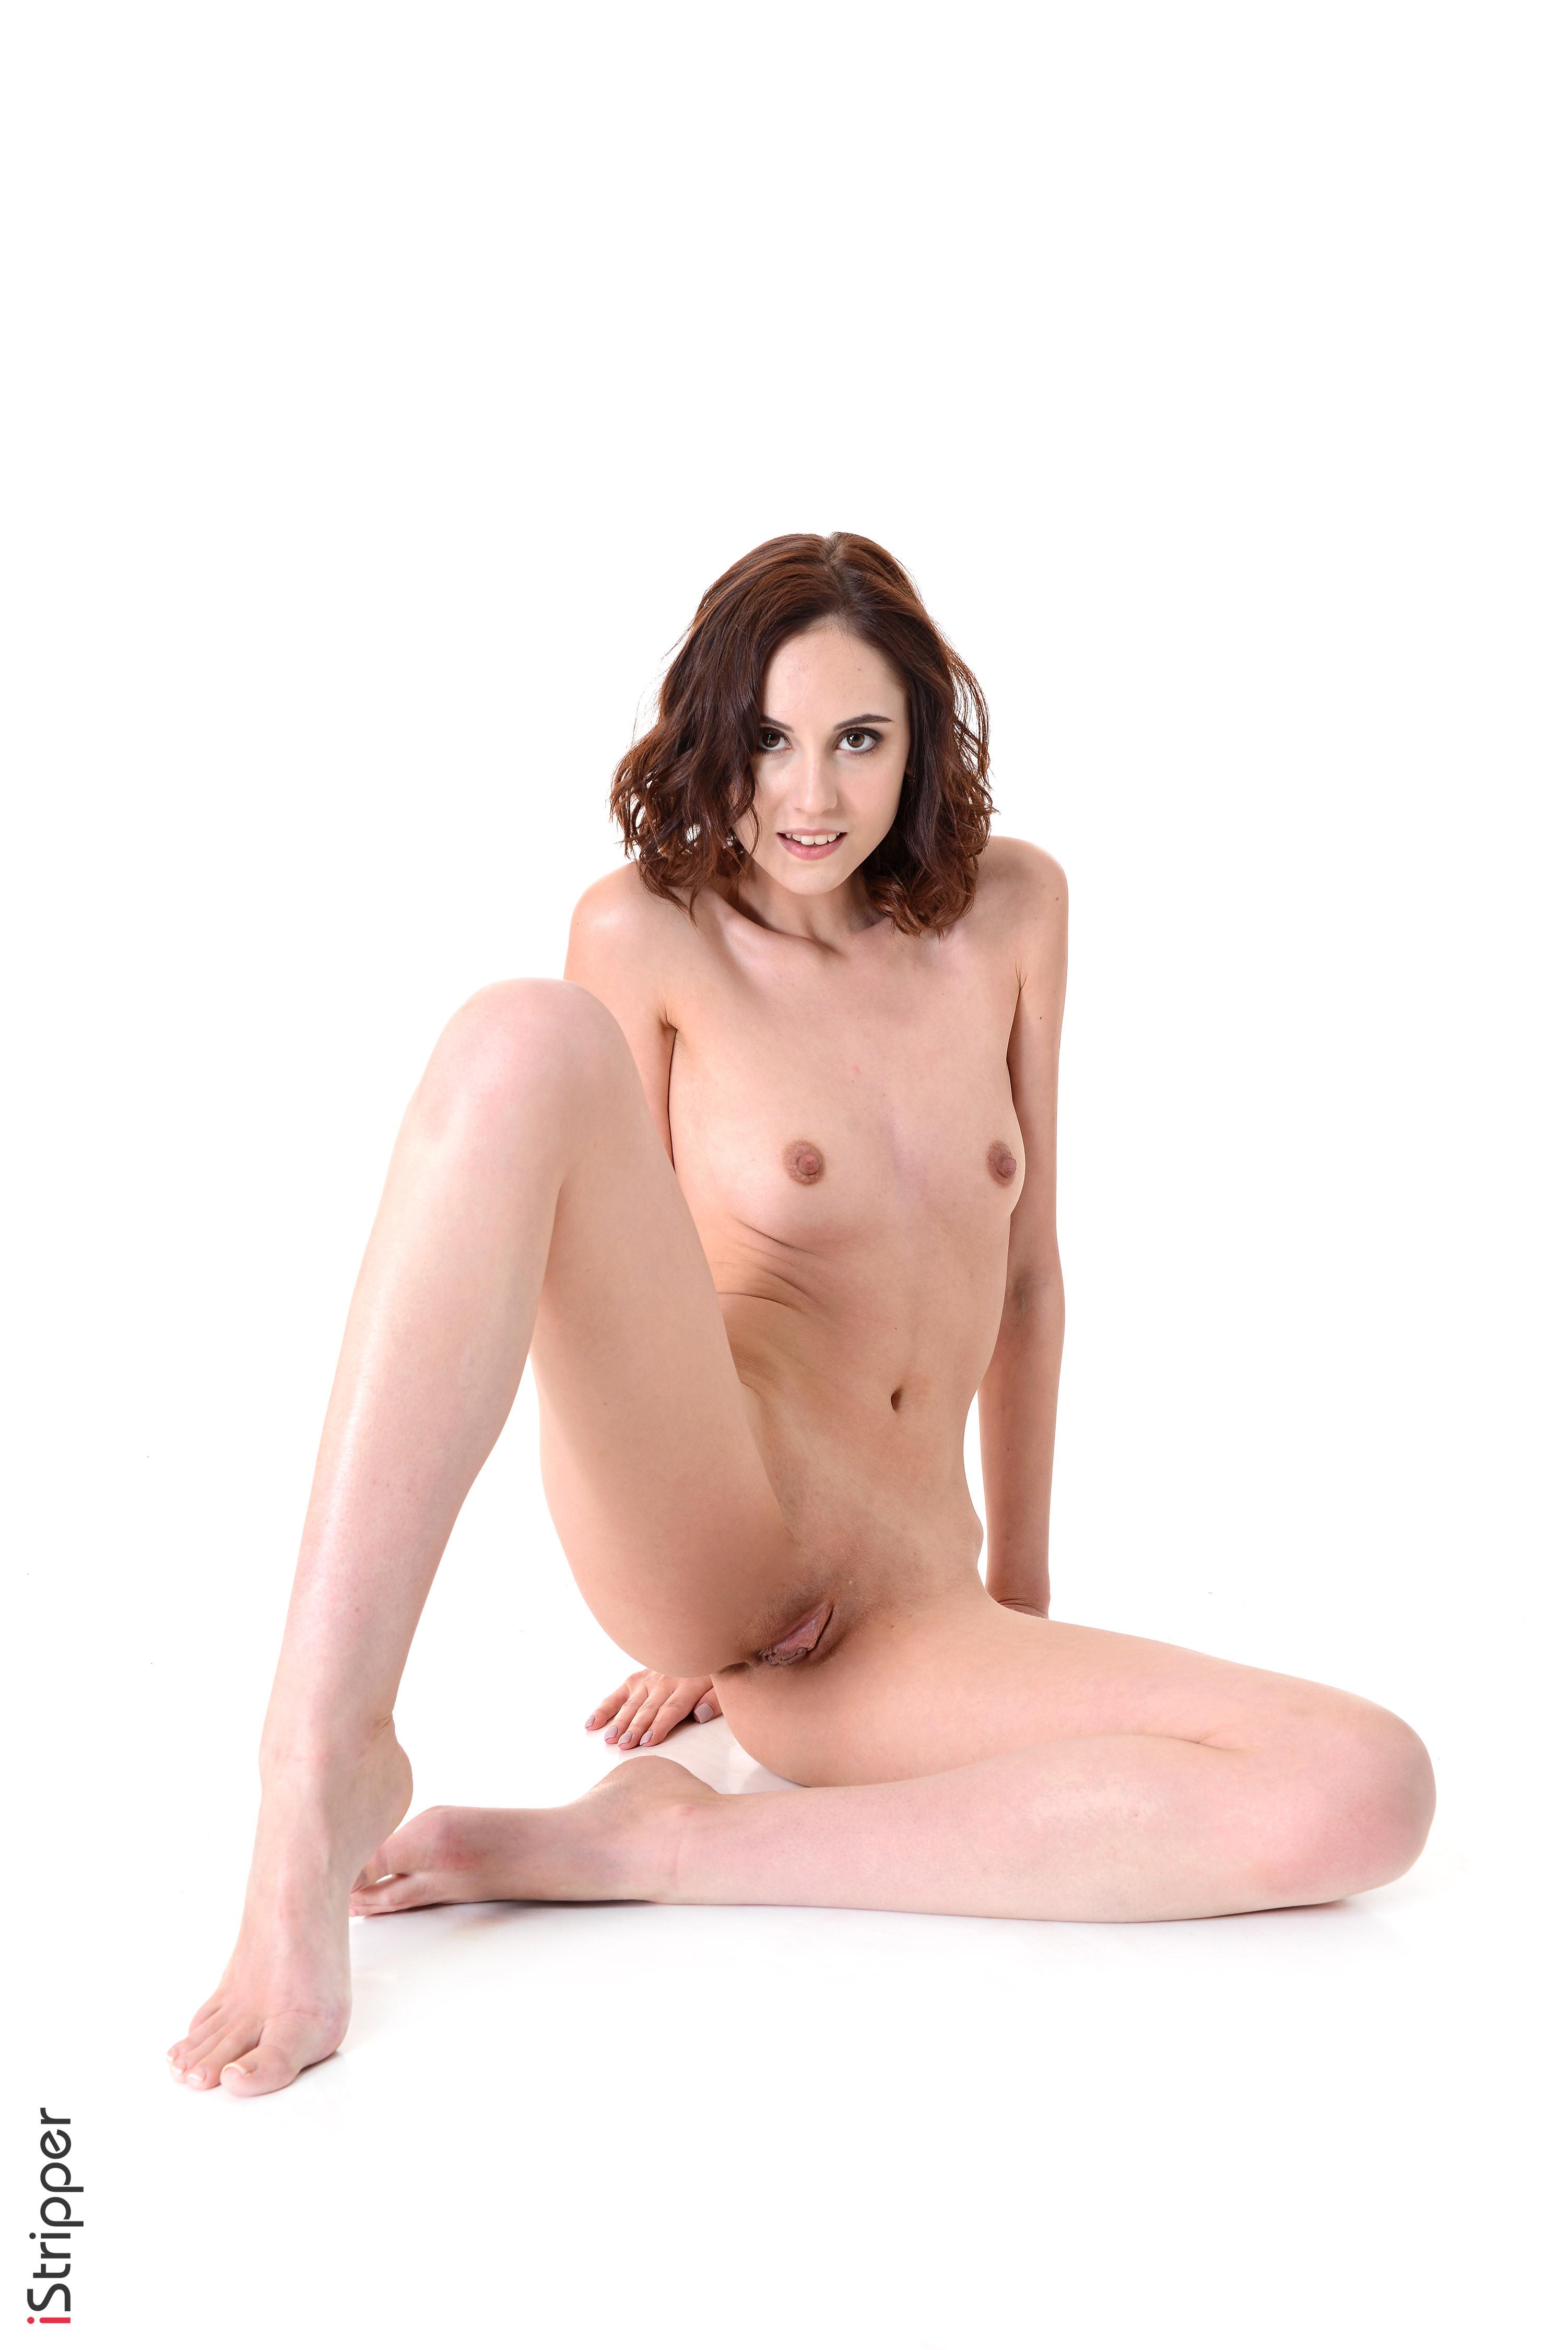 porn wallpaper for pc